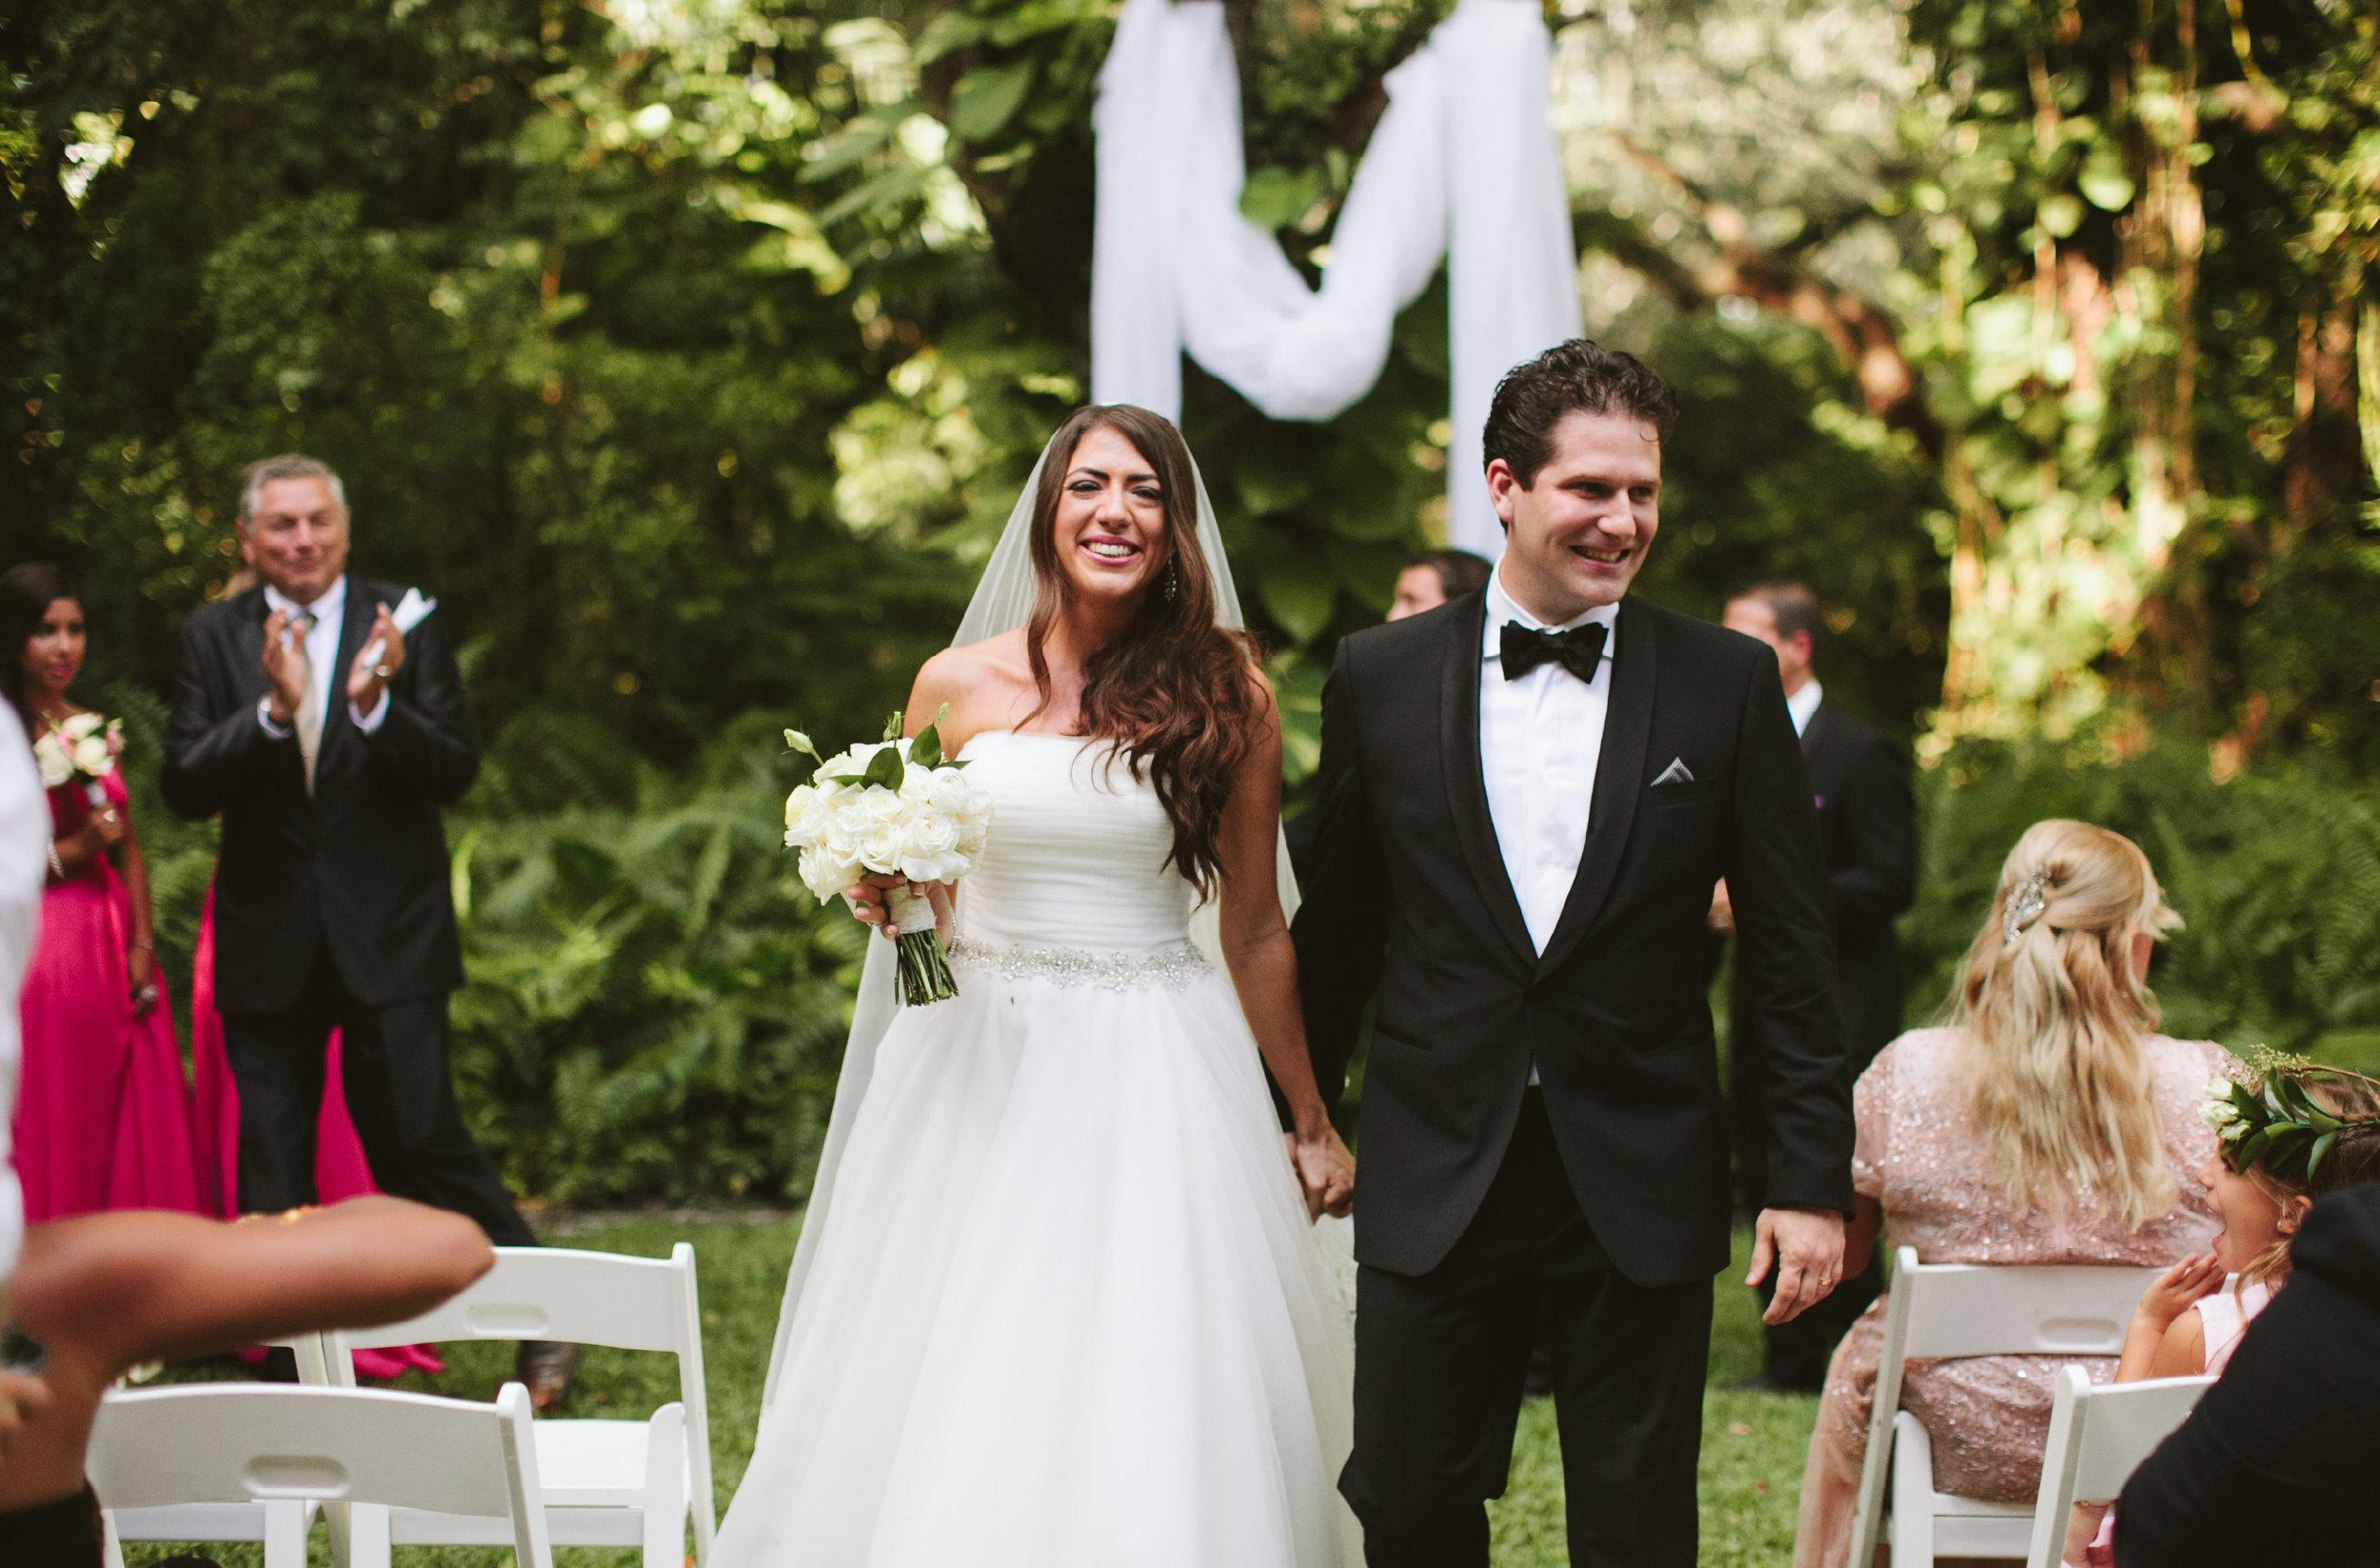 Meli + Mike Coconut Grove Wedding at Villa Woodbine57.jpg